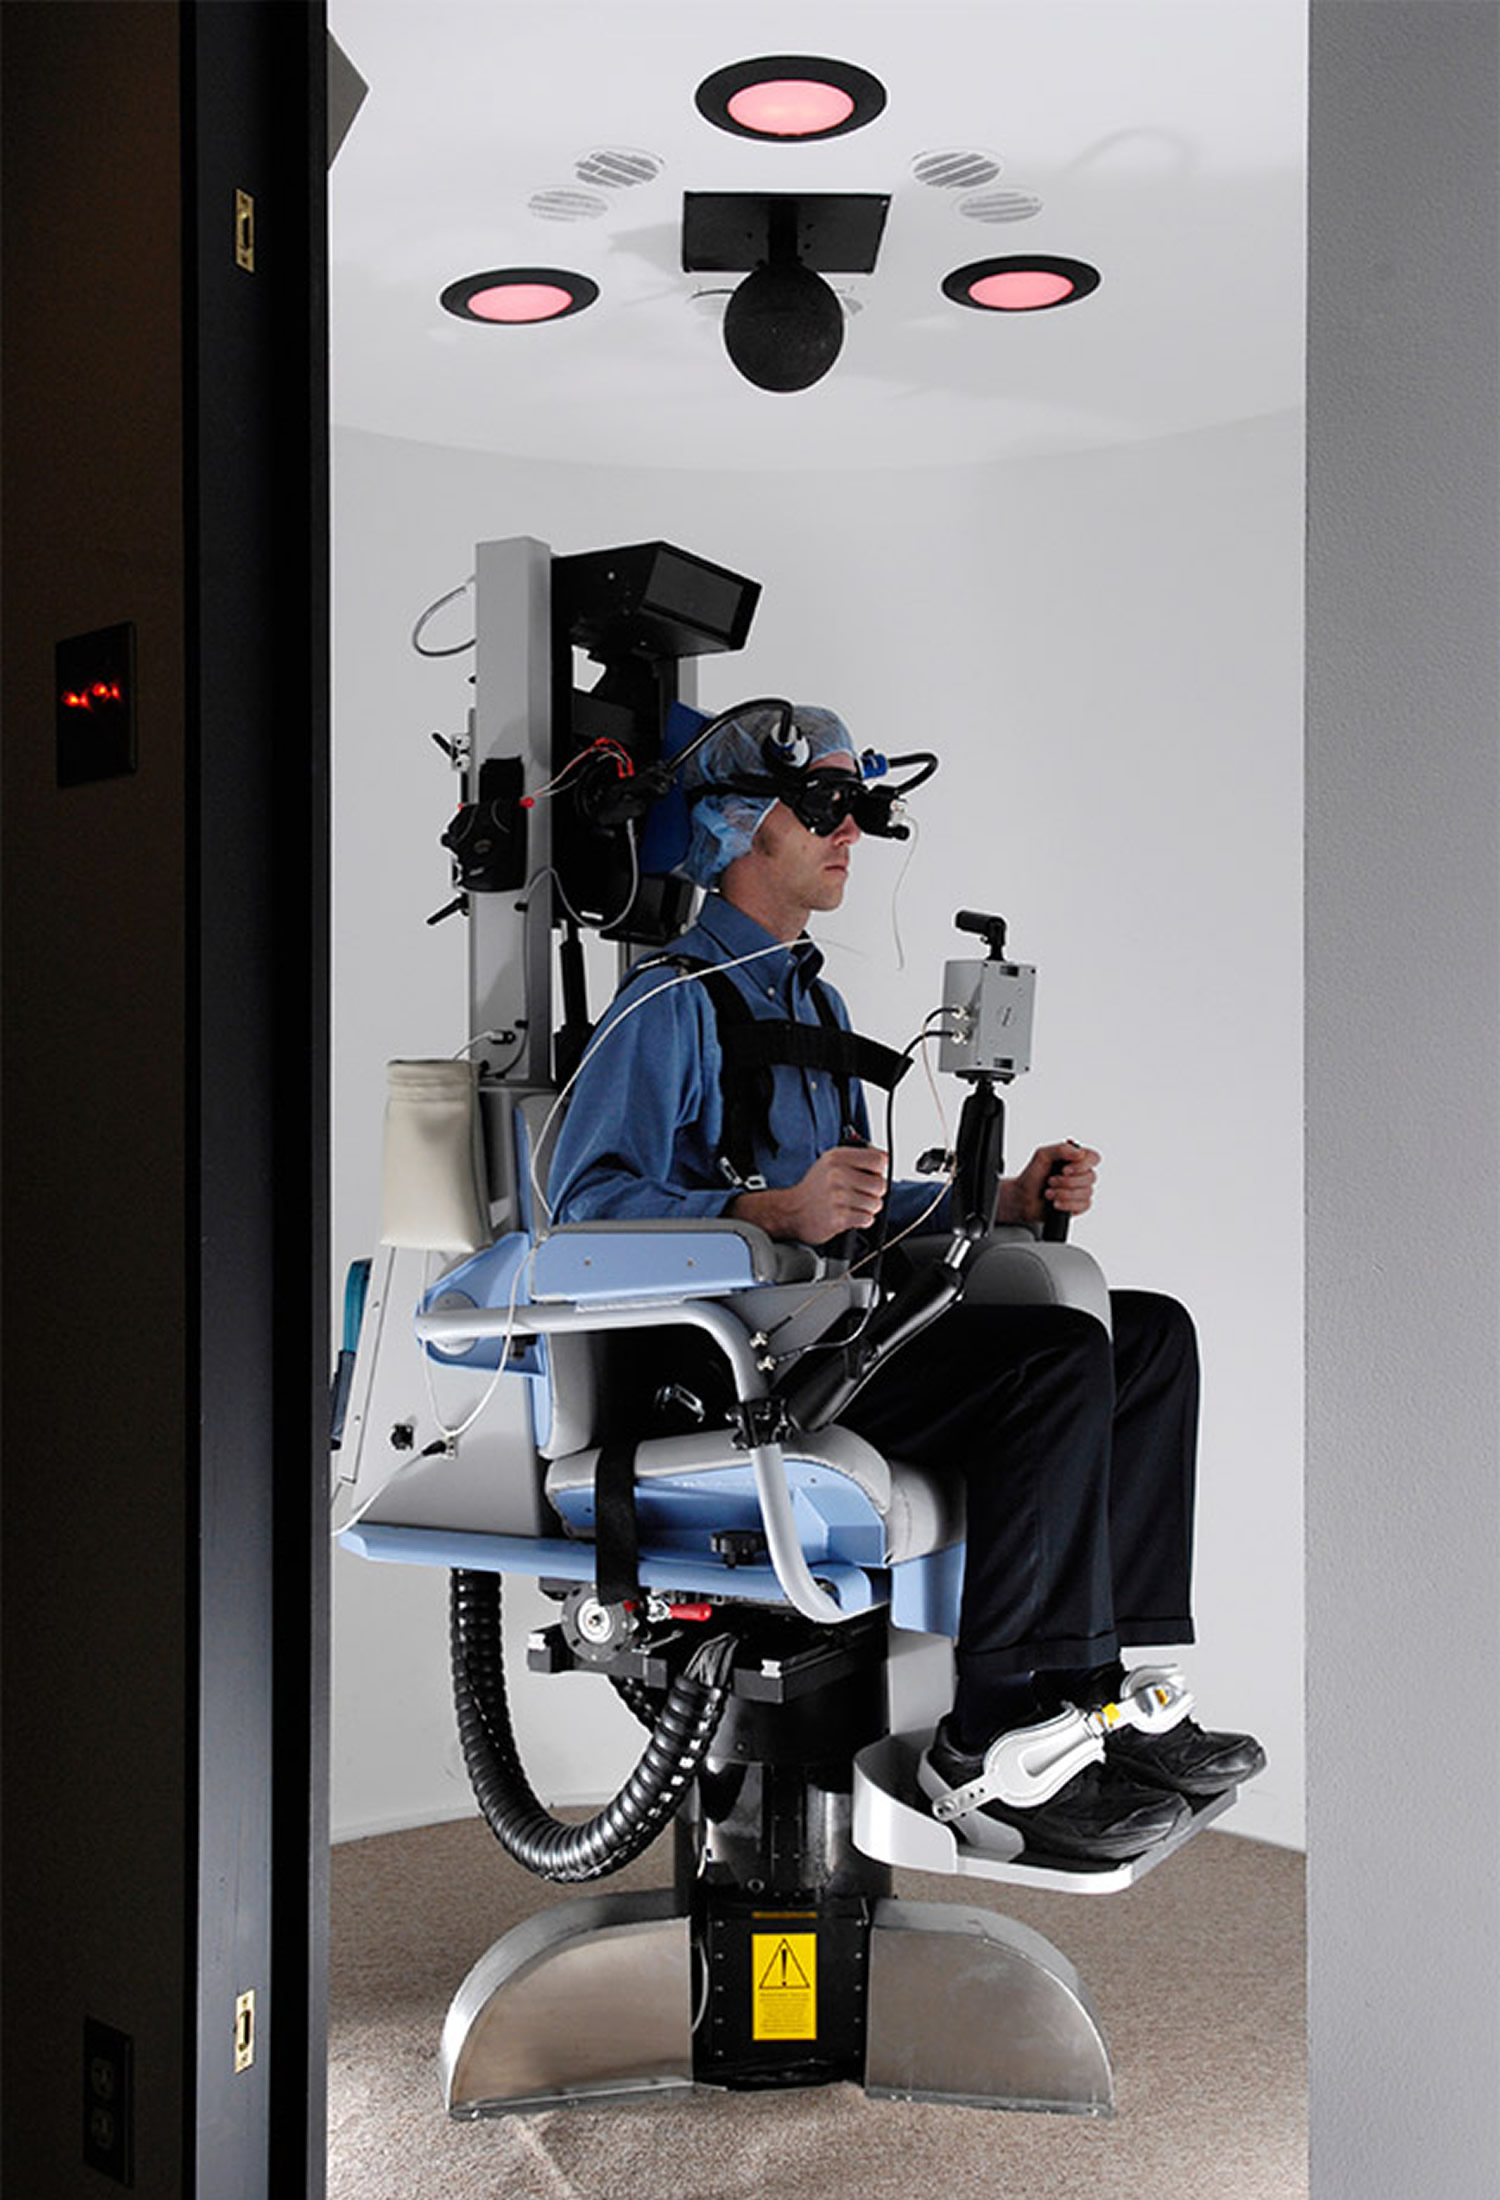 Rotary chair test